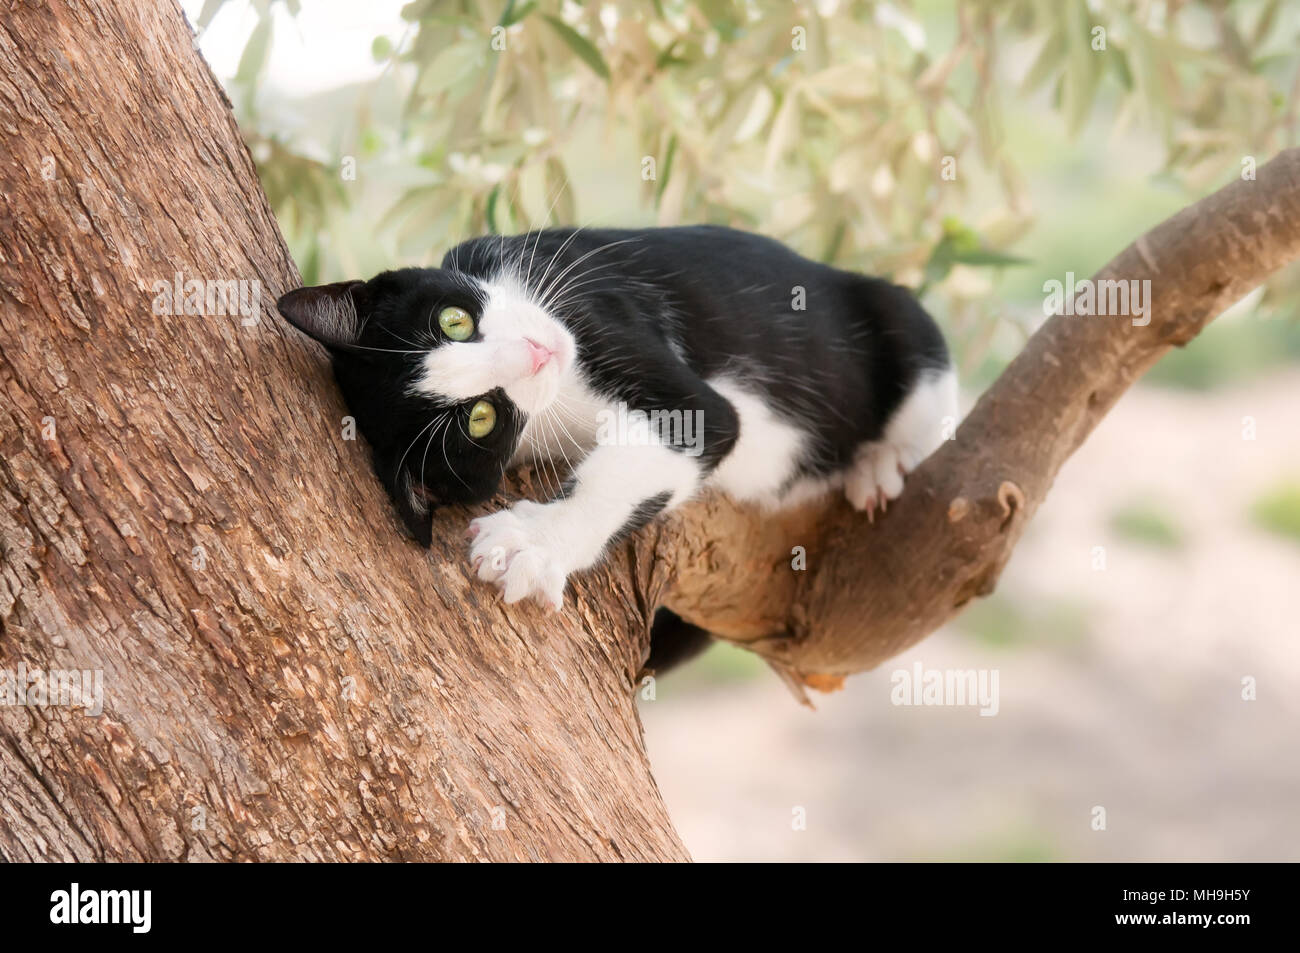 cat fighting game